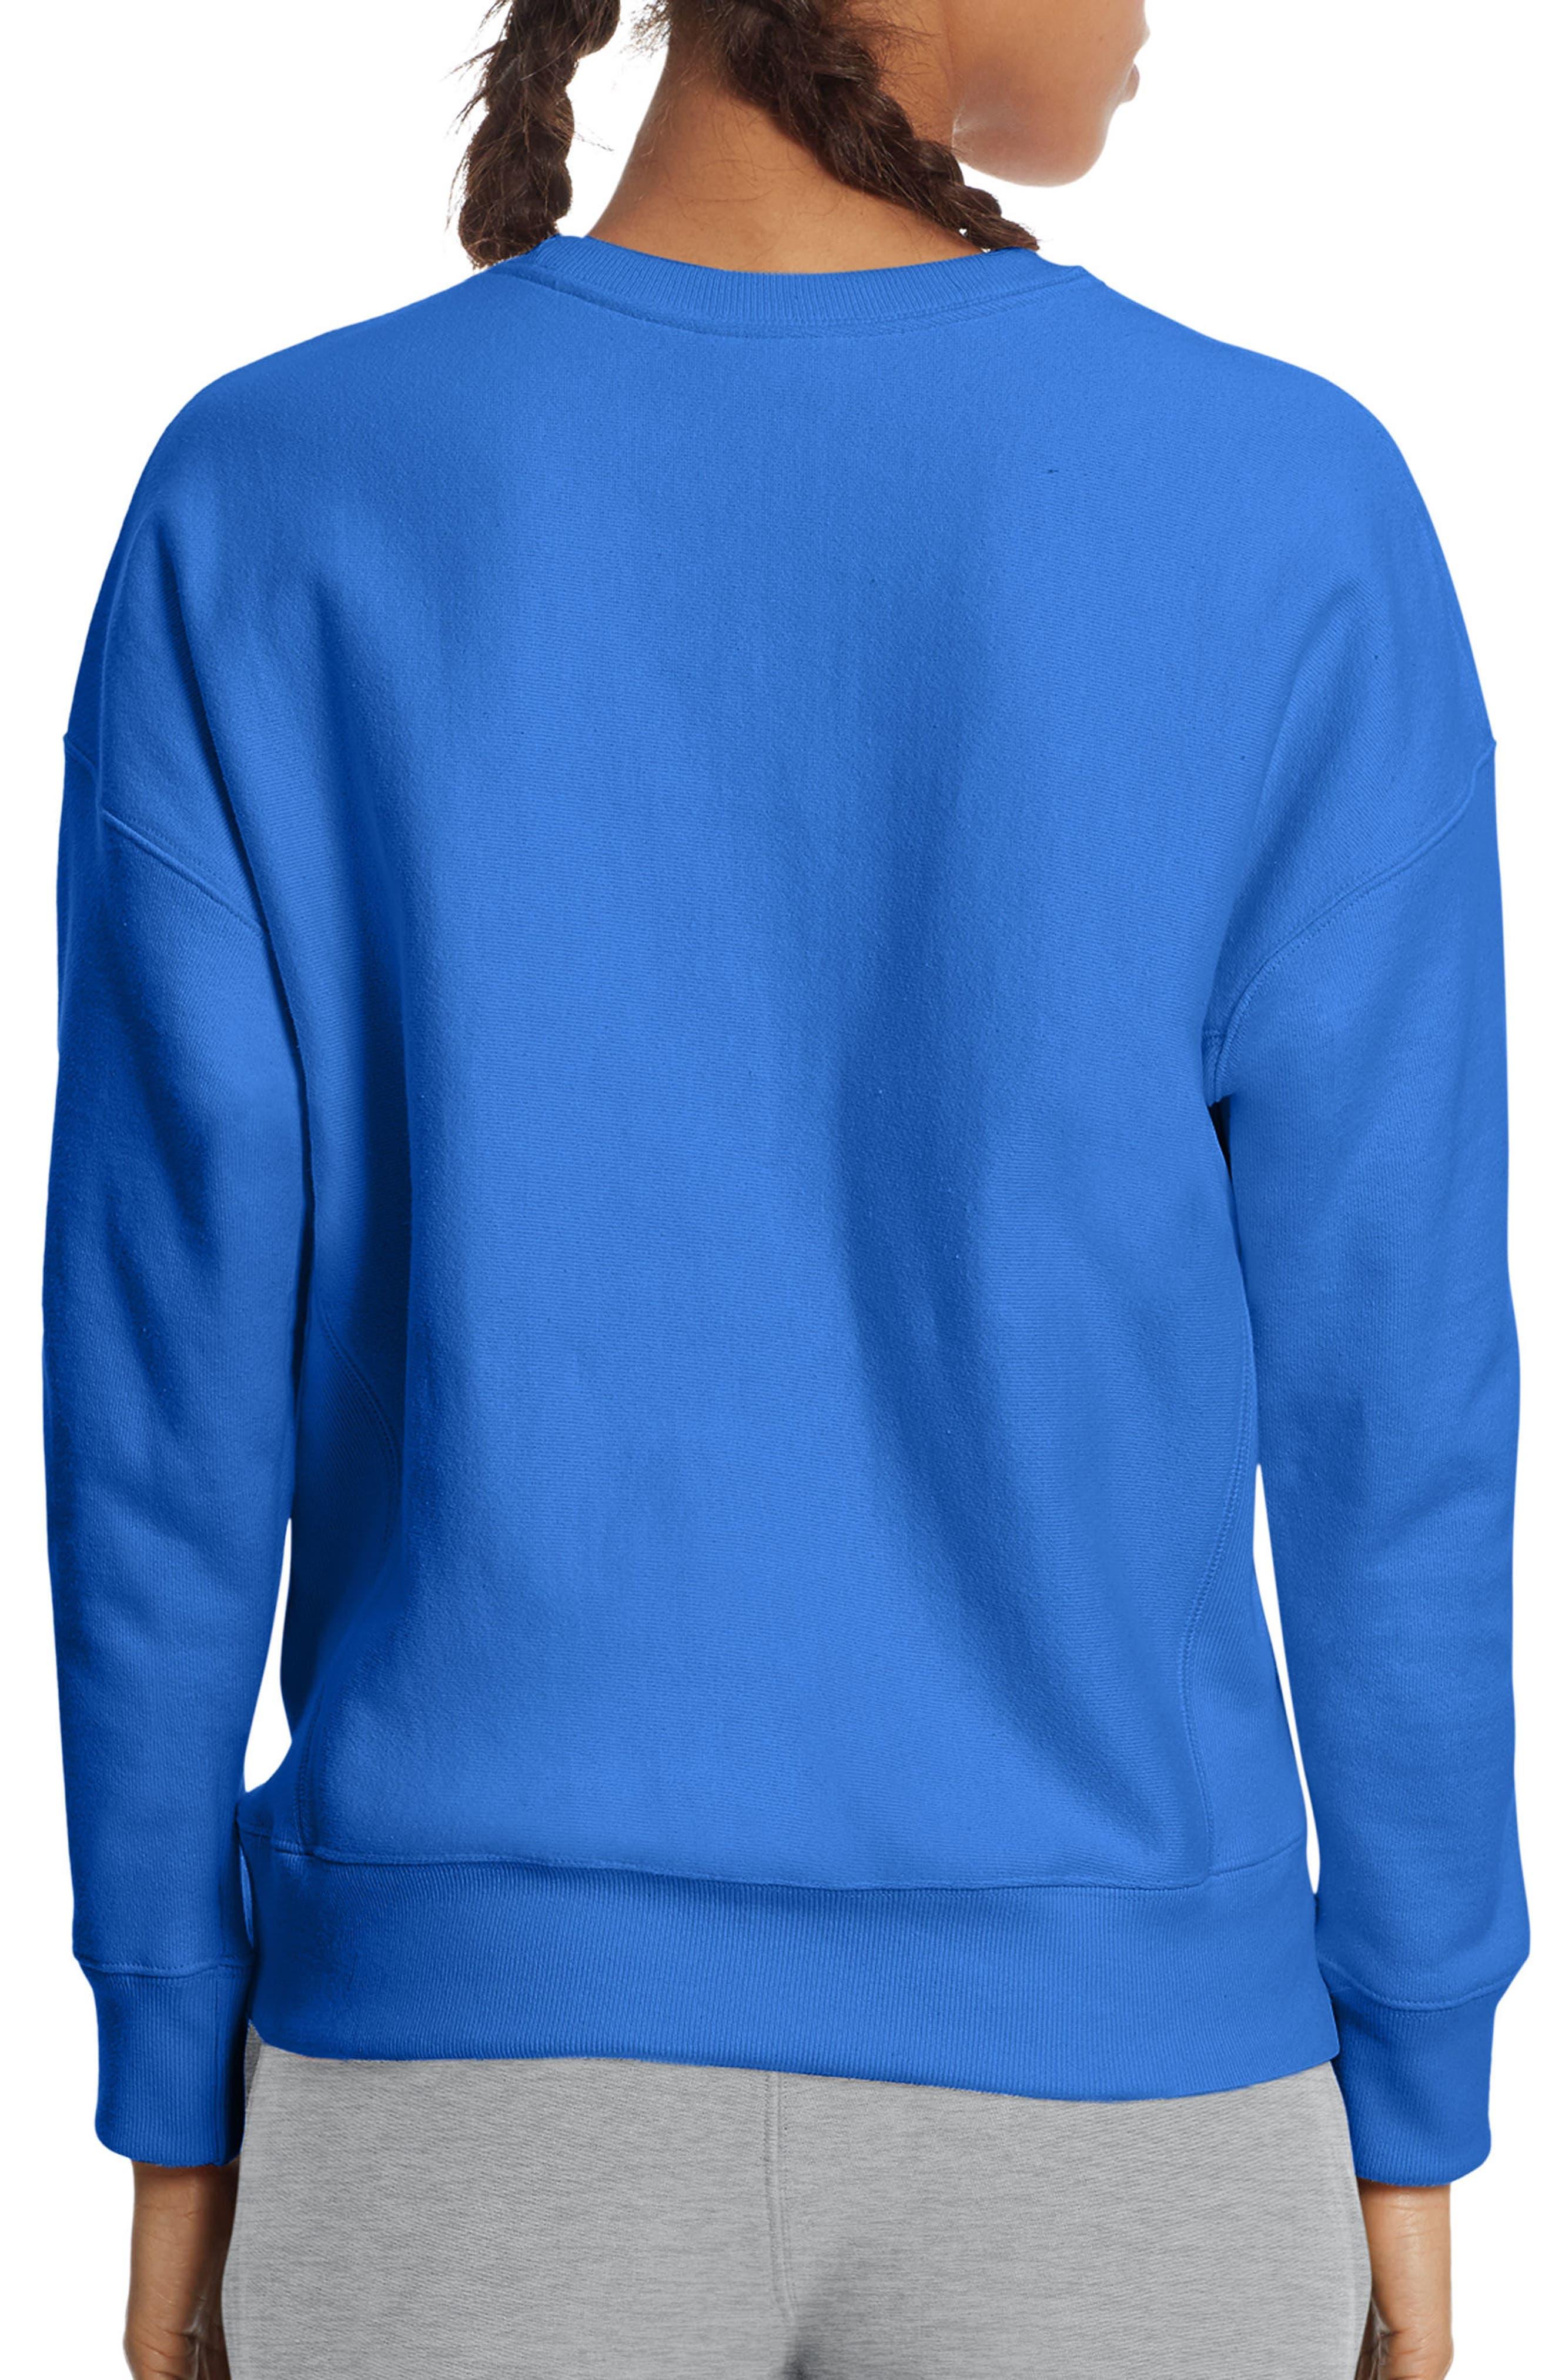 Reverse Weave Crew Sweatshirt,                             Alternate thumbnail 2, color,                             Groove Blue